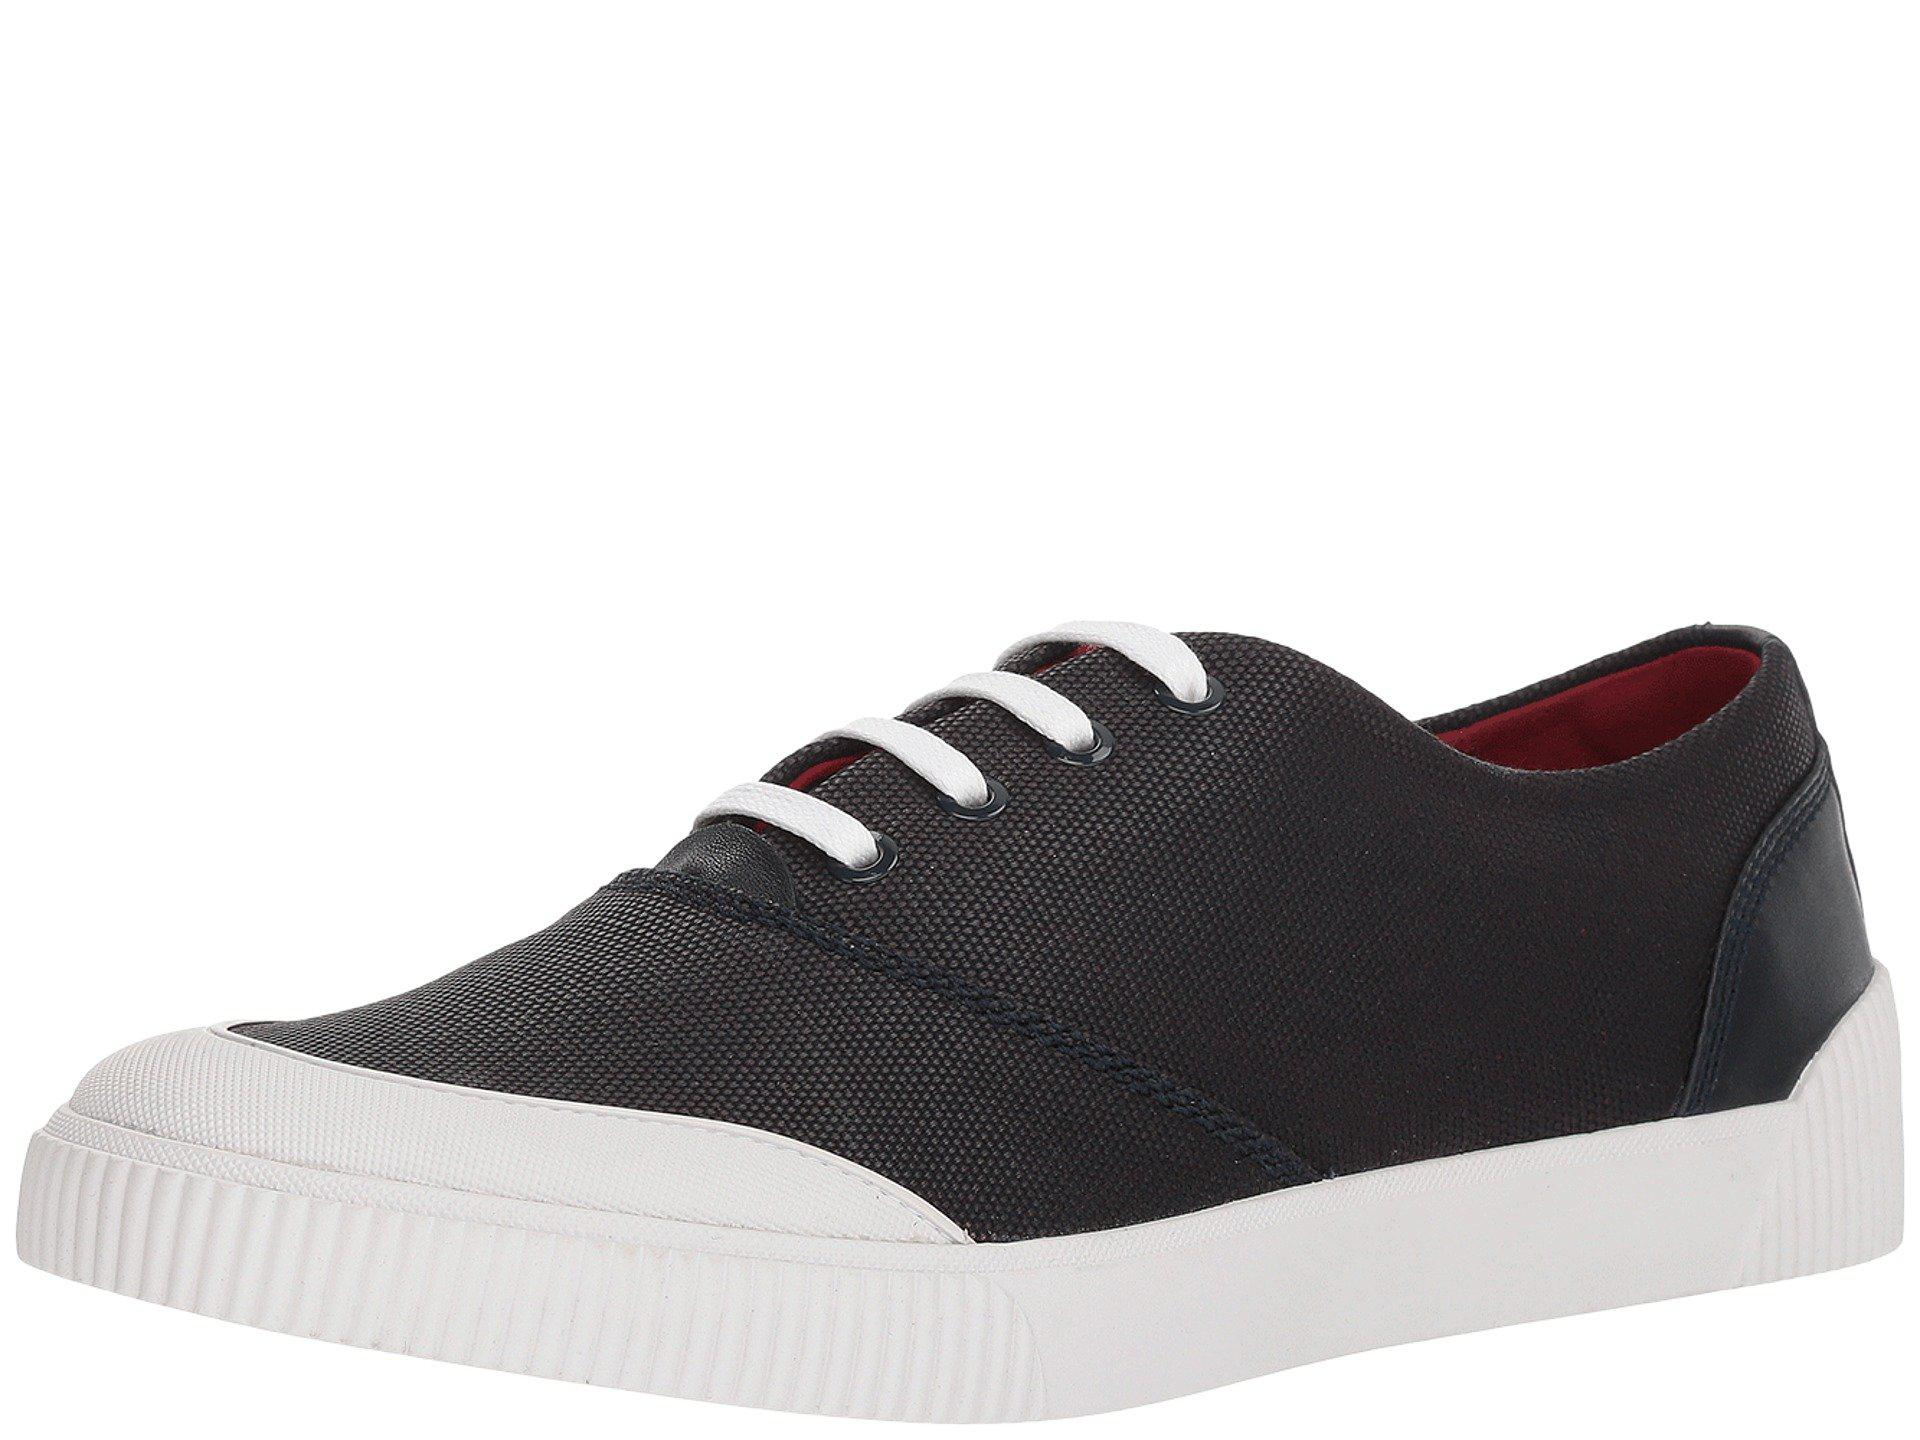 HUGO BOSS Zero Leather Sneaker in DBsiuInUPe